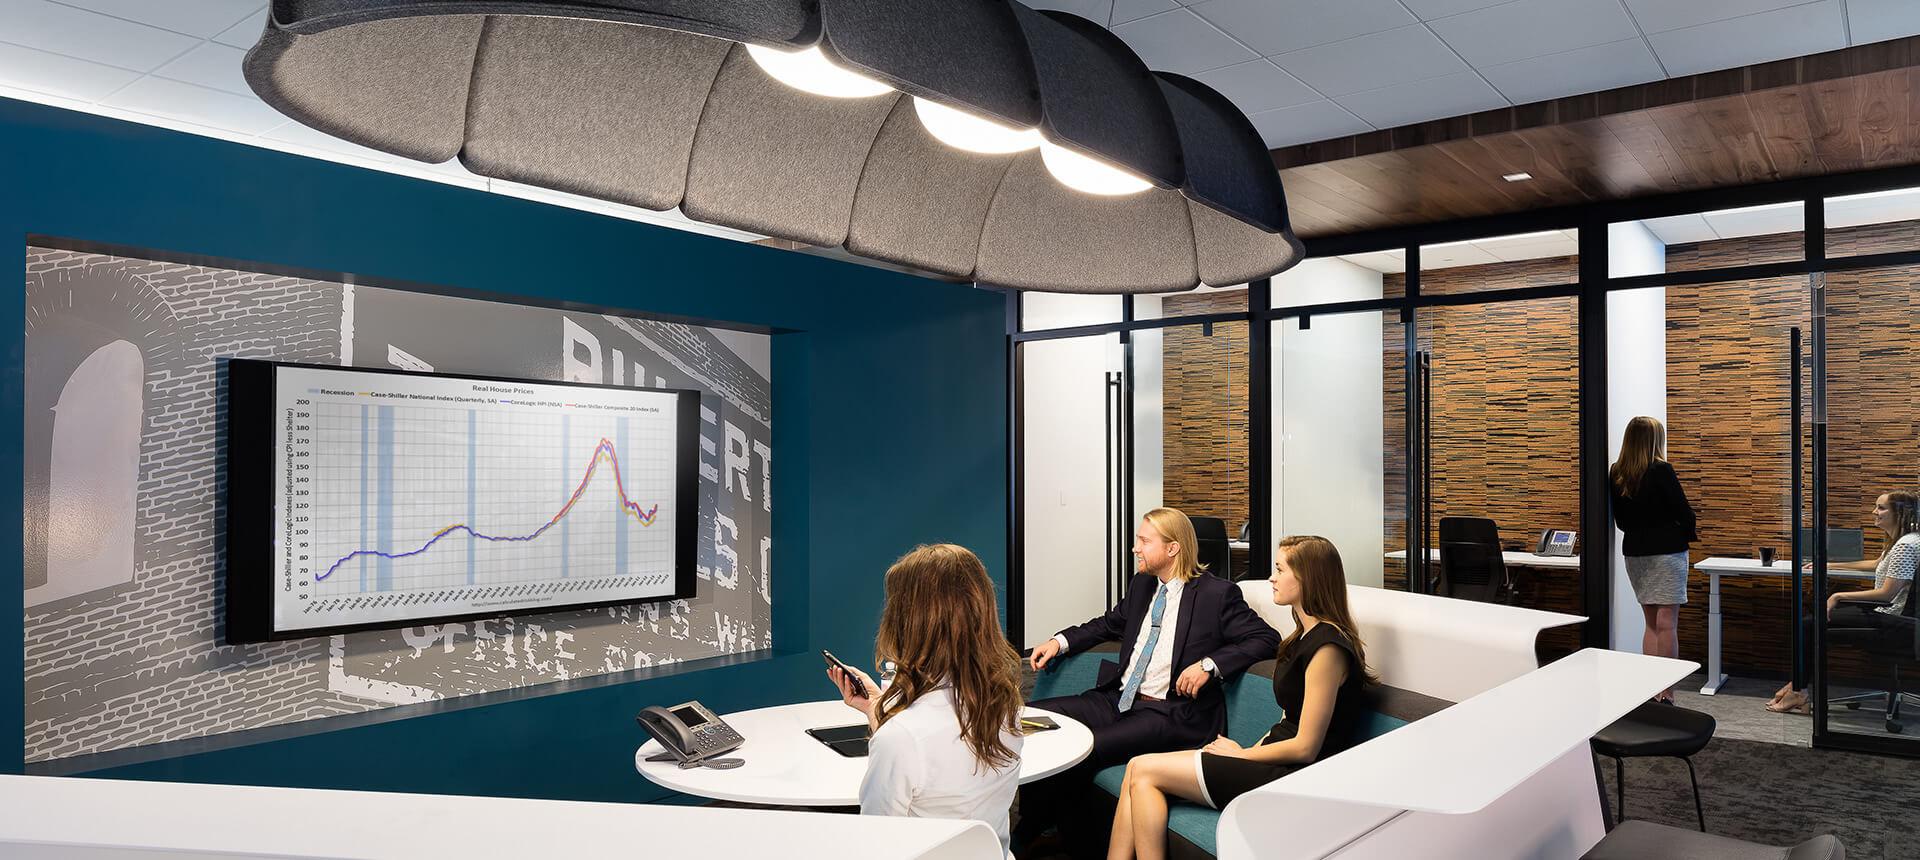 JLL Baltimore Office Interior Design CallisonRTKL